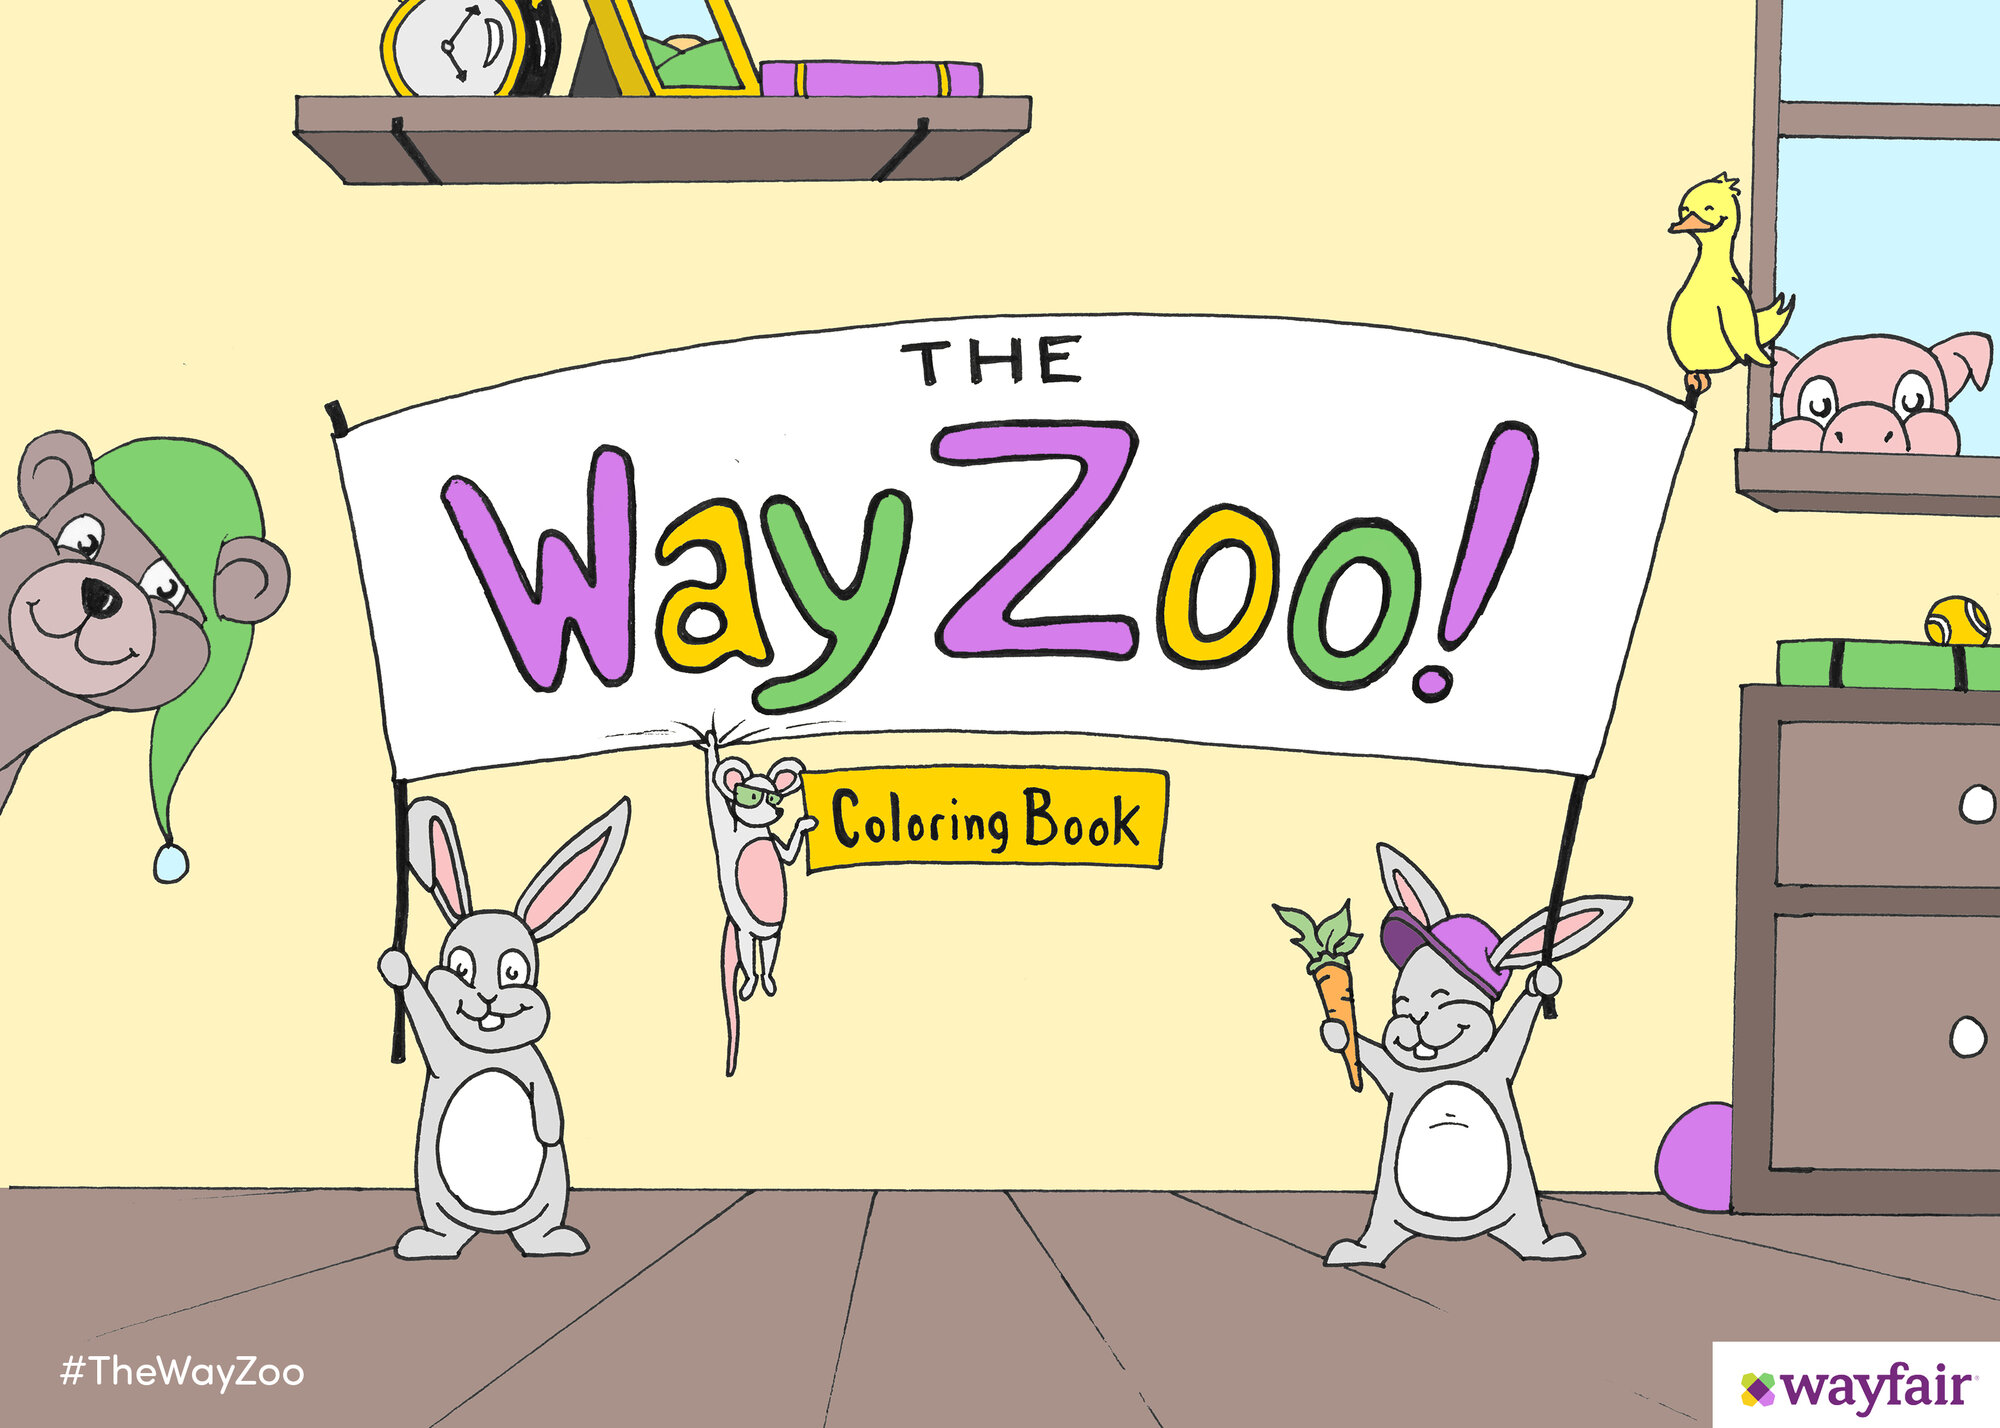 The WayZoo Coloring Book Contest | Wayfair